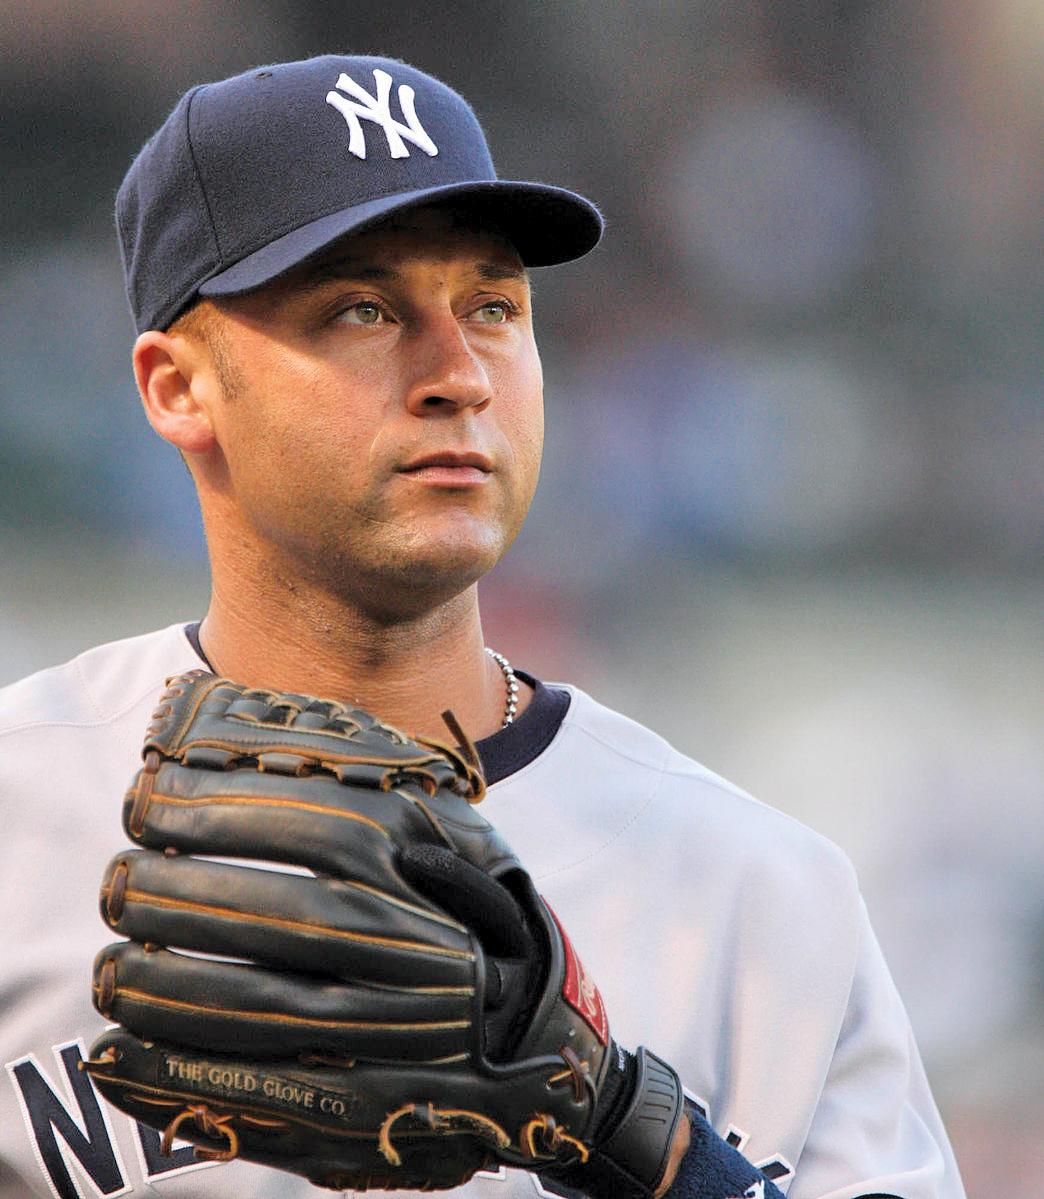 Former New York Yankees shortstop Derek Jeter headlined the 2020 Hall of Fame inductees.